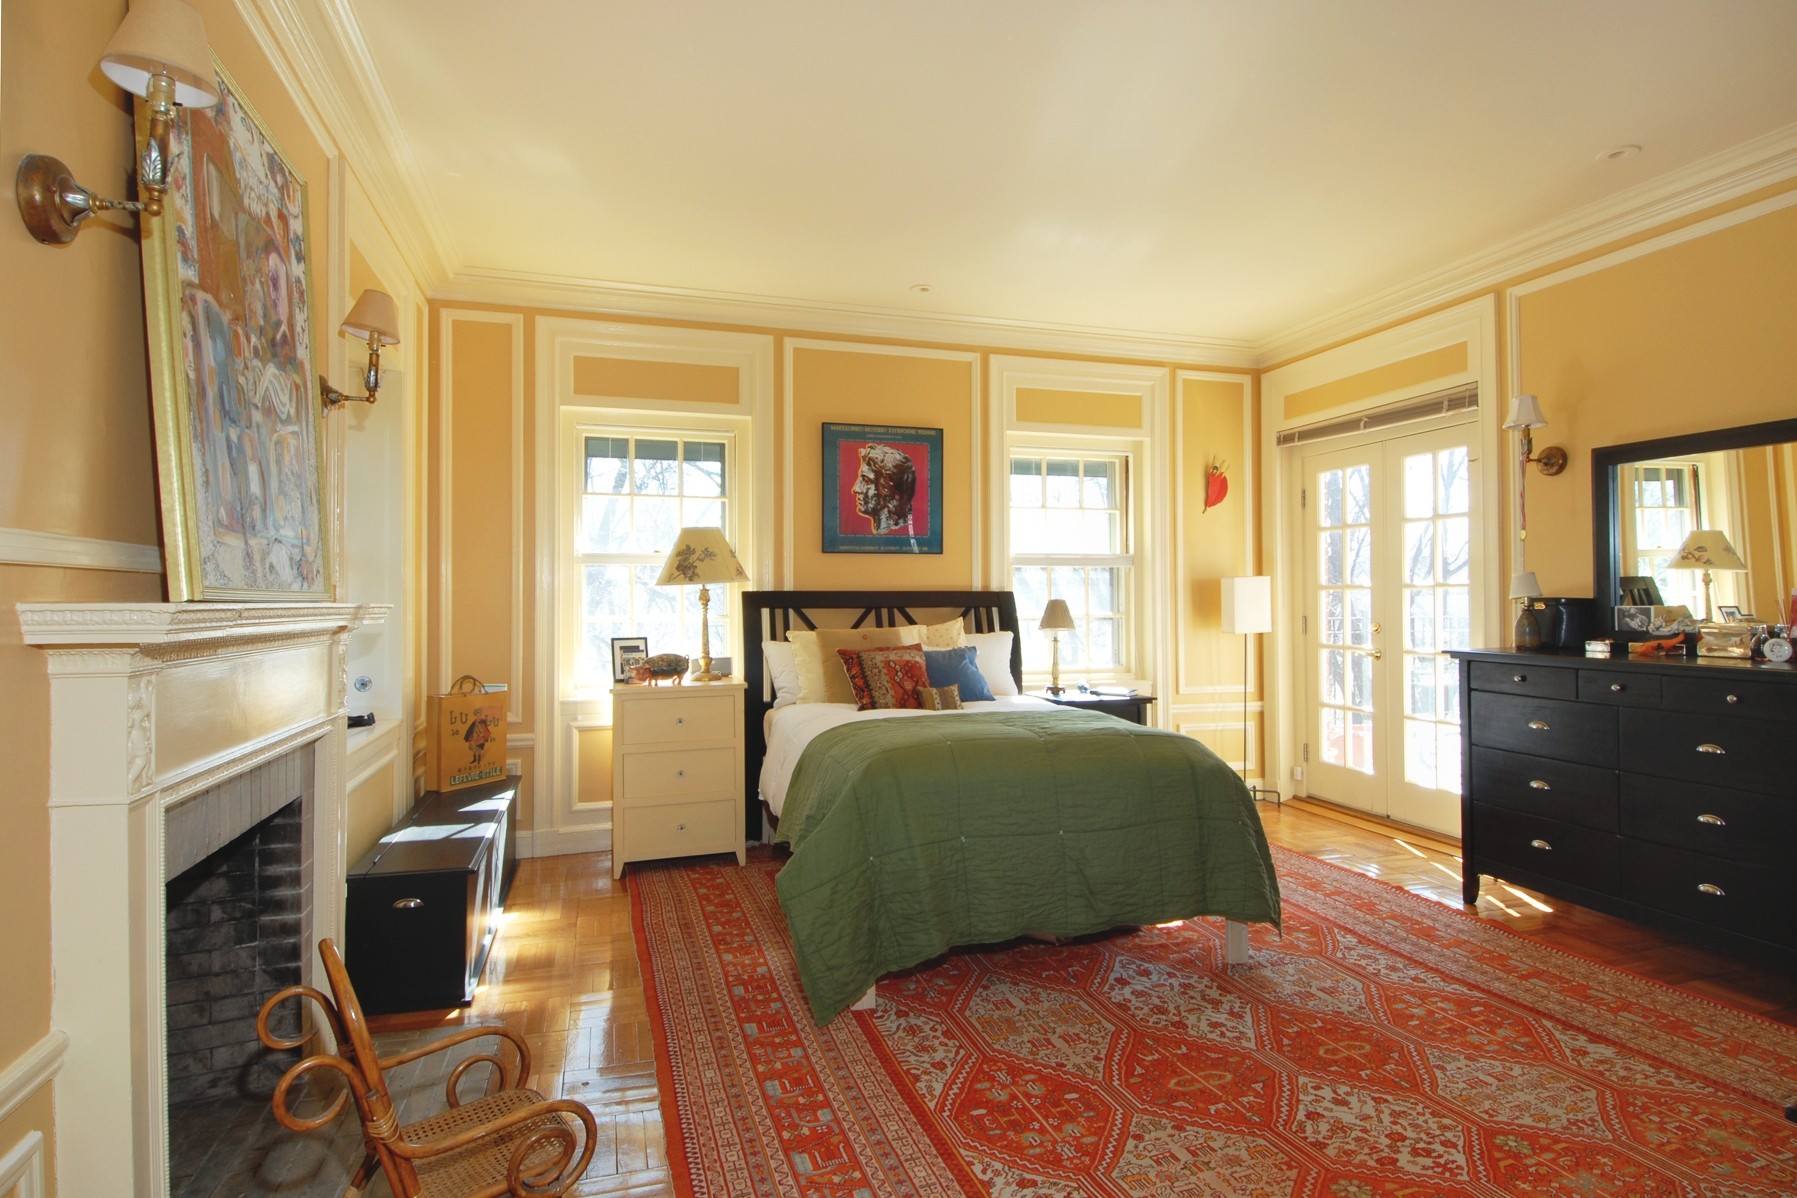 190 Ivy bedroom 2.jpg